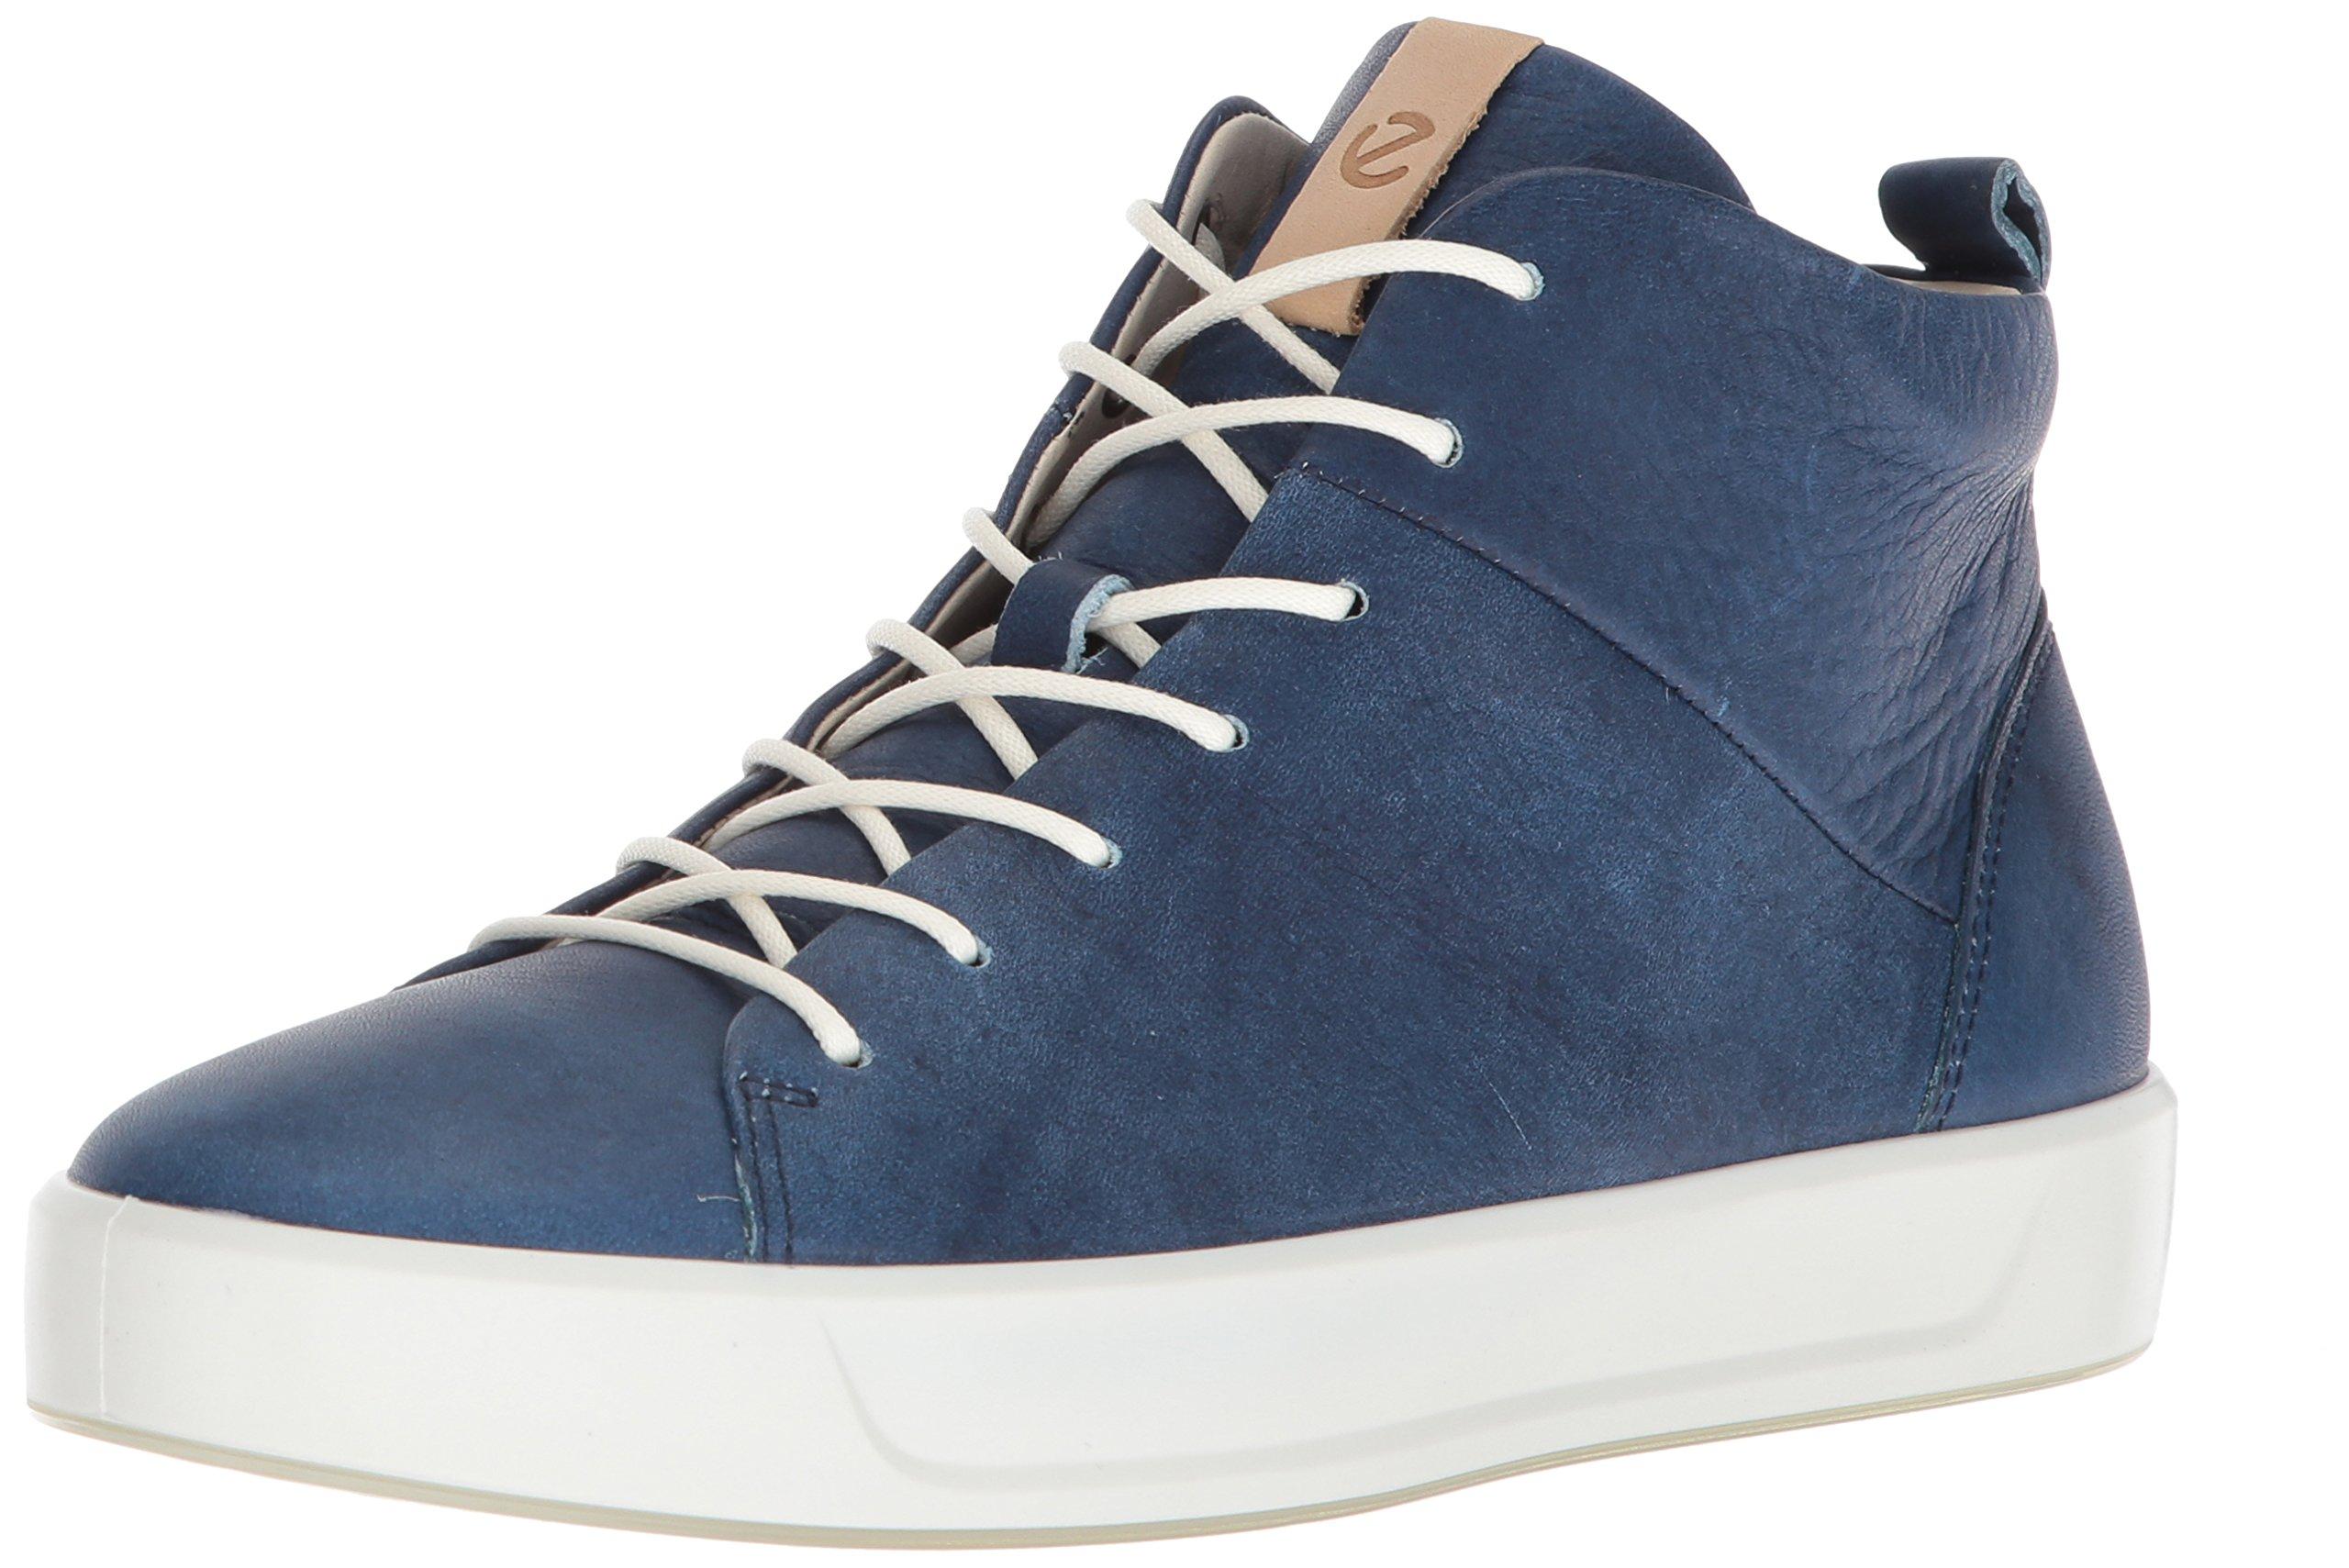 ECCO Women's Women's Soft 8 High-Top Sneaker, Indigo, 40 Medium EU (9-9.5 US)